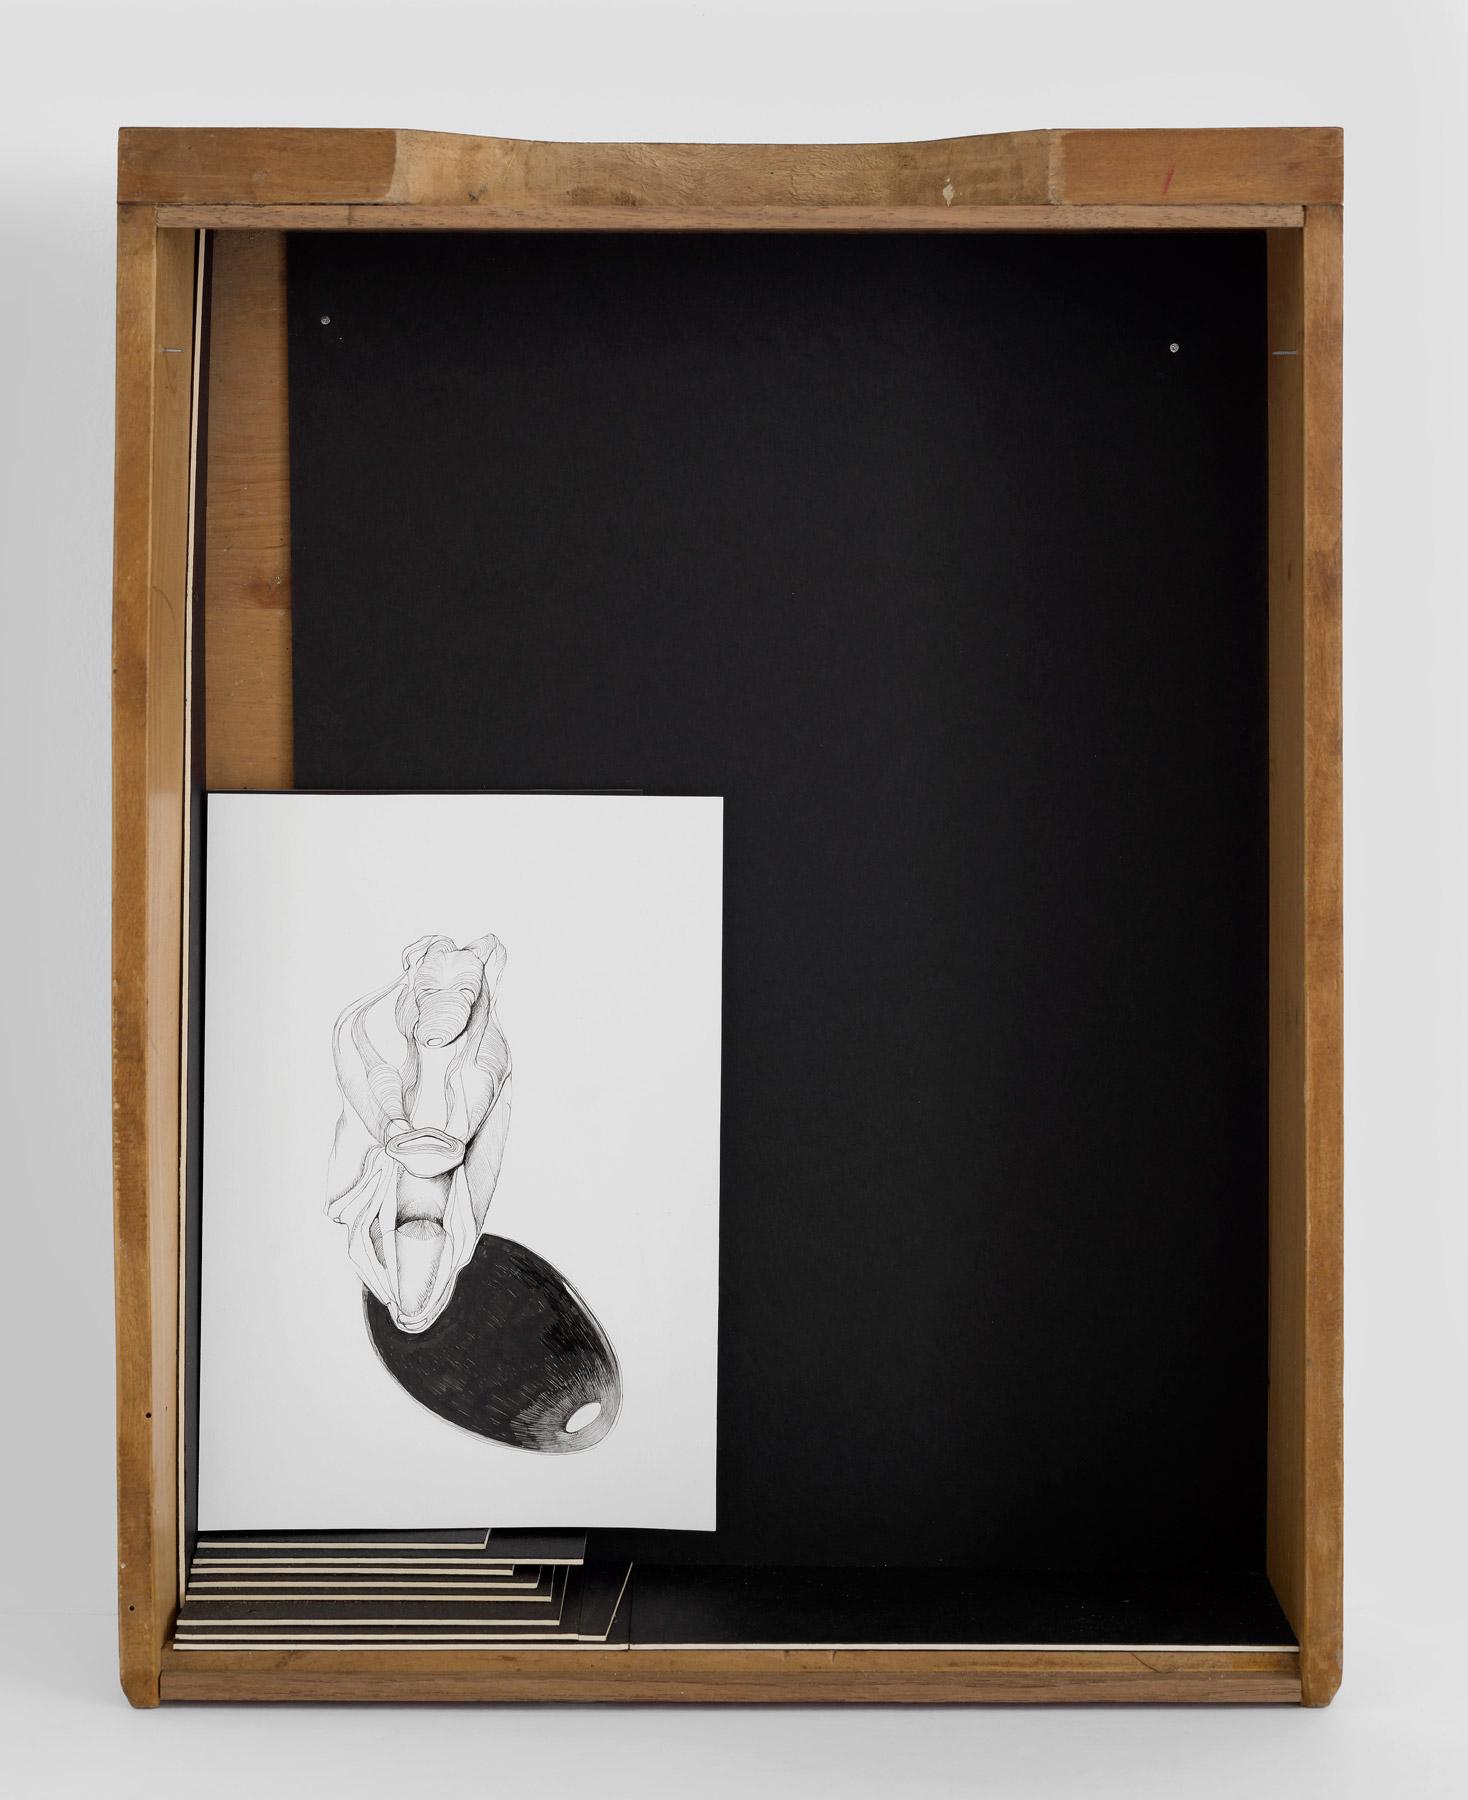 Nina Annabelle Märkl | Untitled | Ink and pencil on paper, black cardboard, box | 43 x 33 x 8 cm | 2014 | photo: Walter Bayer